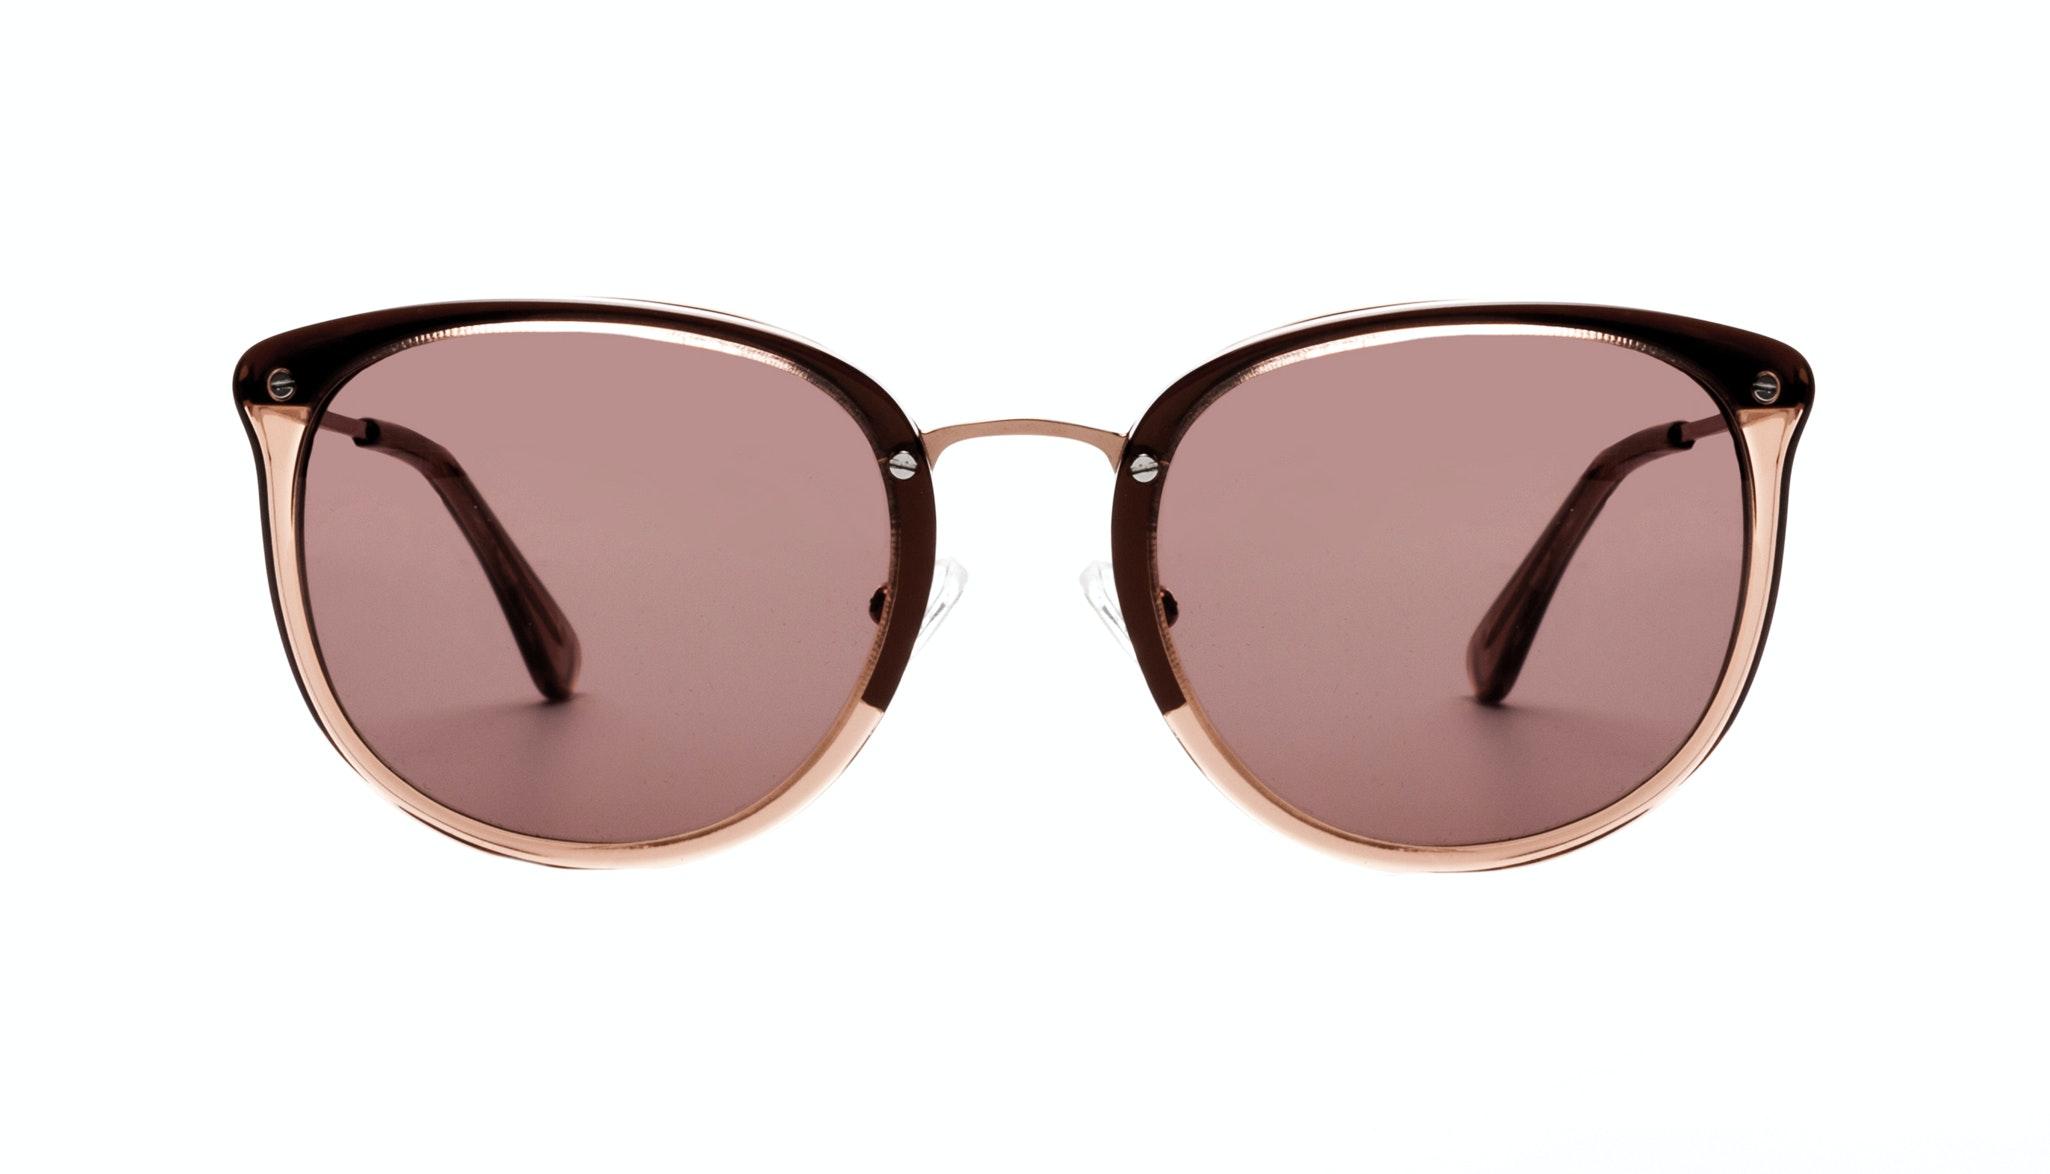 Affordable Fashion Glasses Square Round Sunglasses Women Amaze Rose